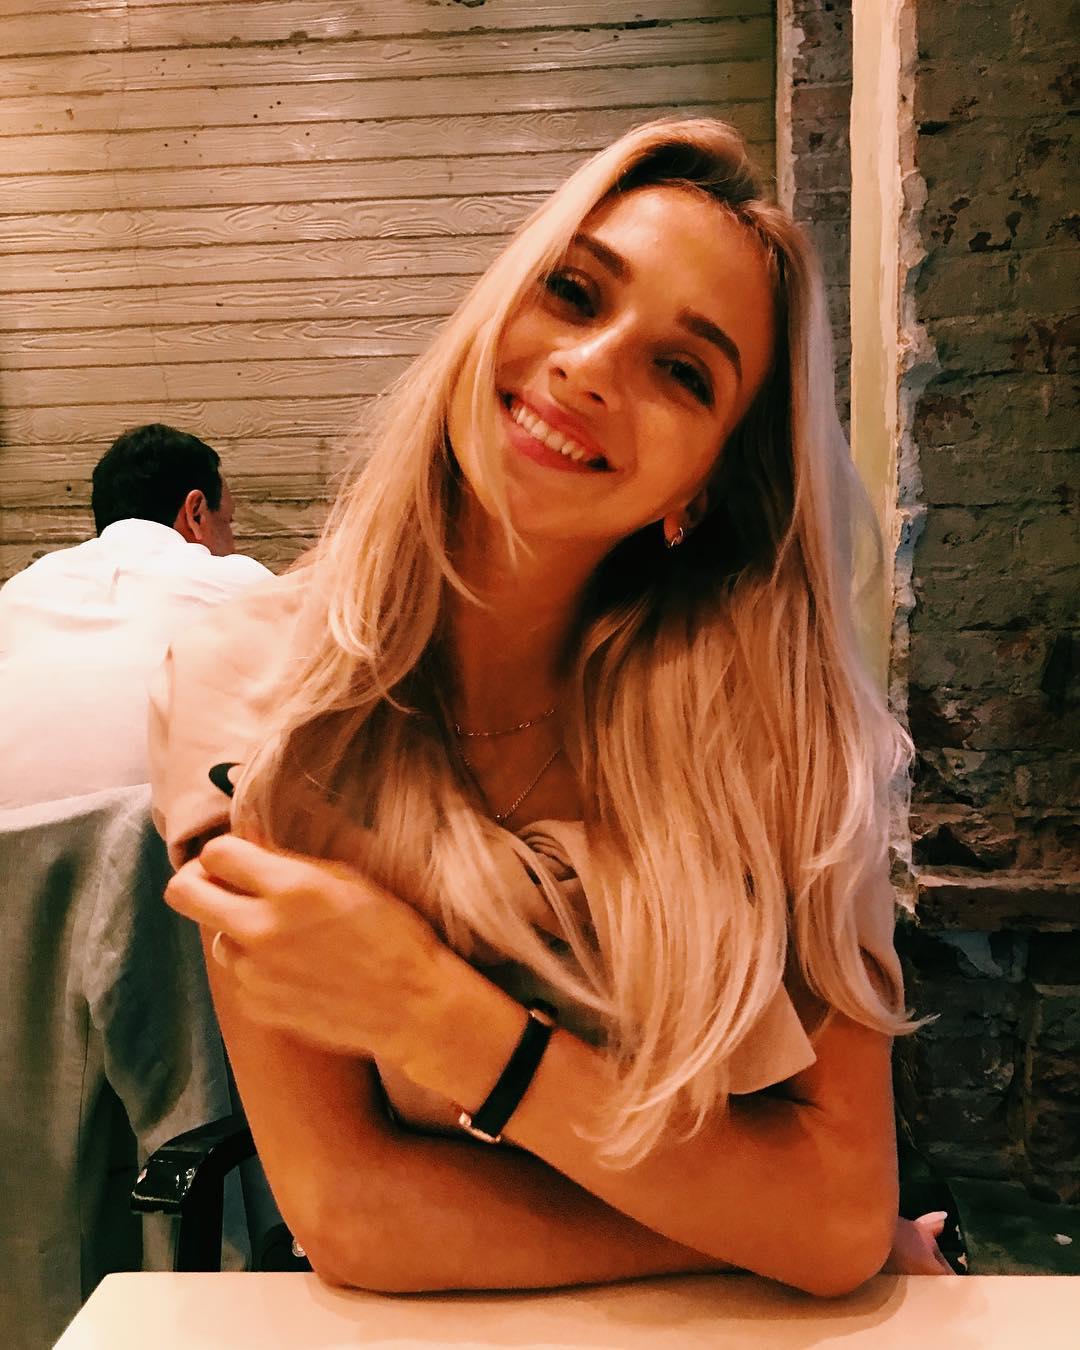 Виктория Синицина - Никита Кацалапов - 7 - Страница 20 PMdB1WkXAXE